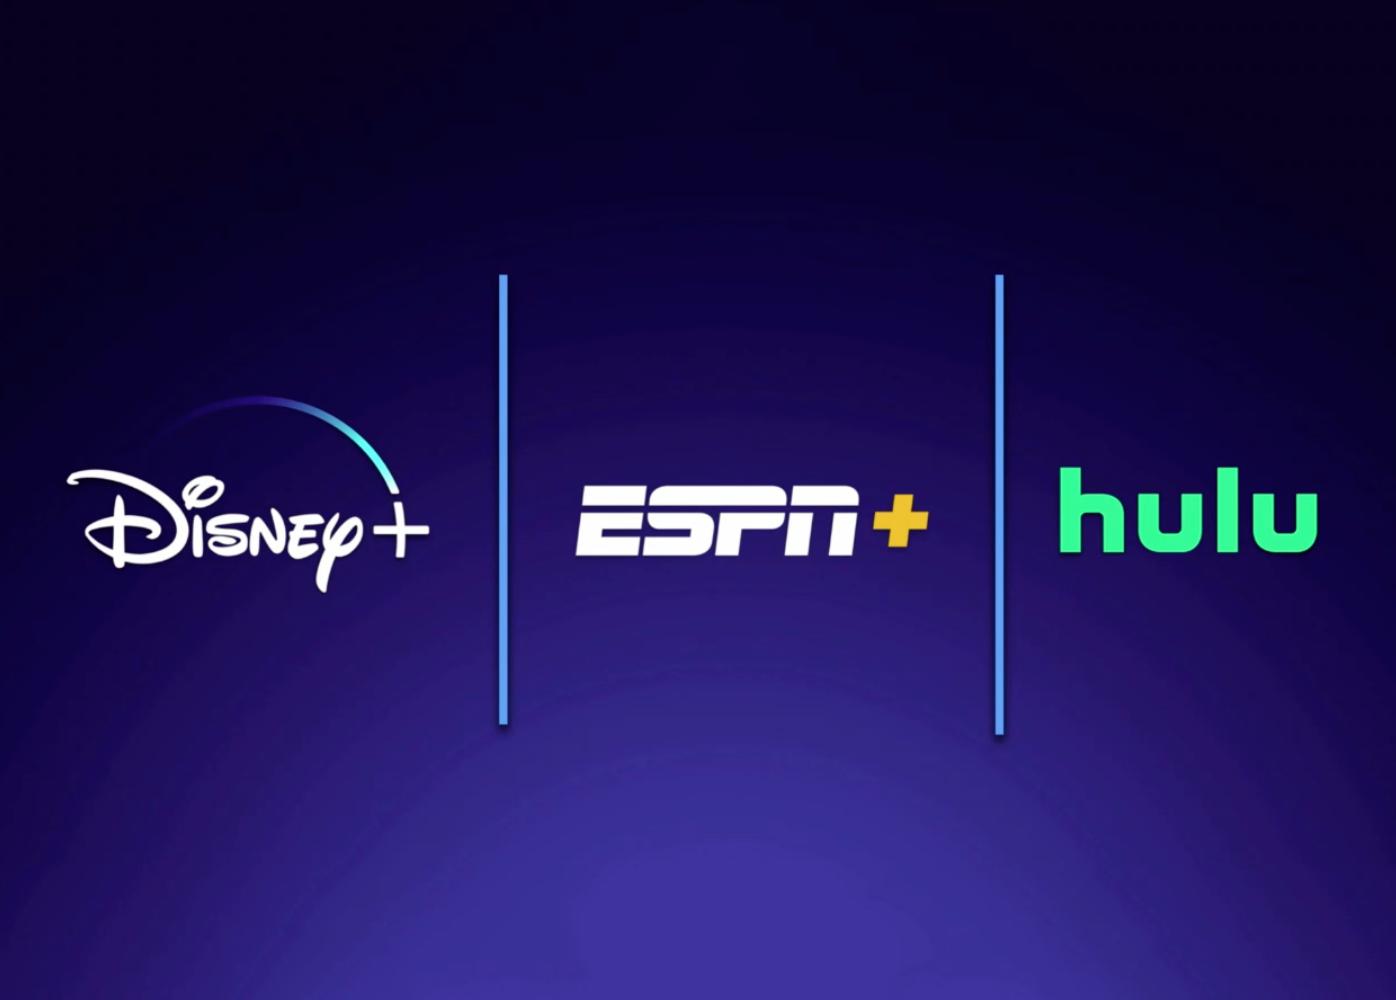 Disney Plus ESPN Plus Hulu bundle